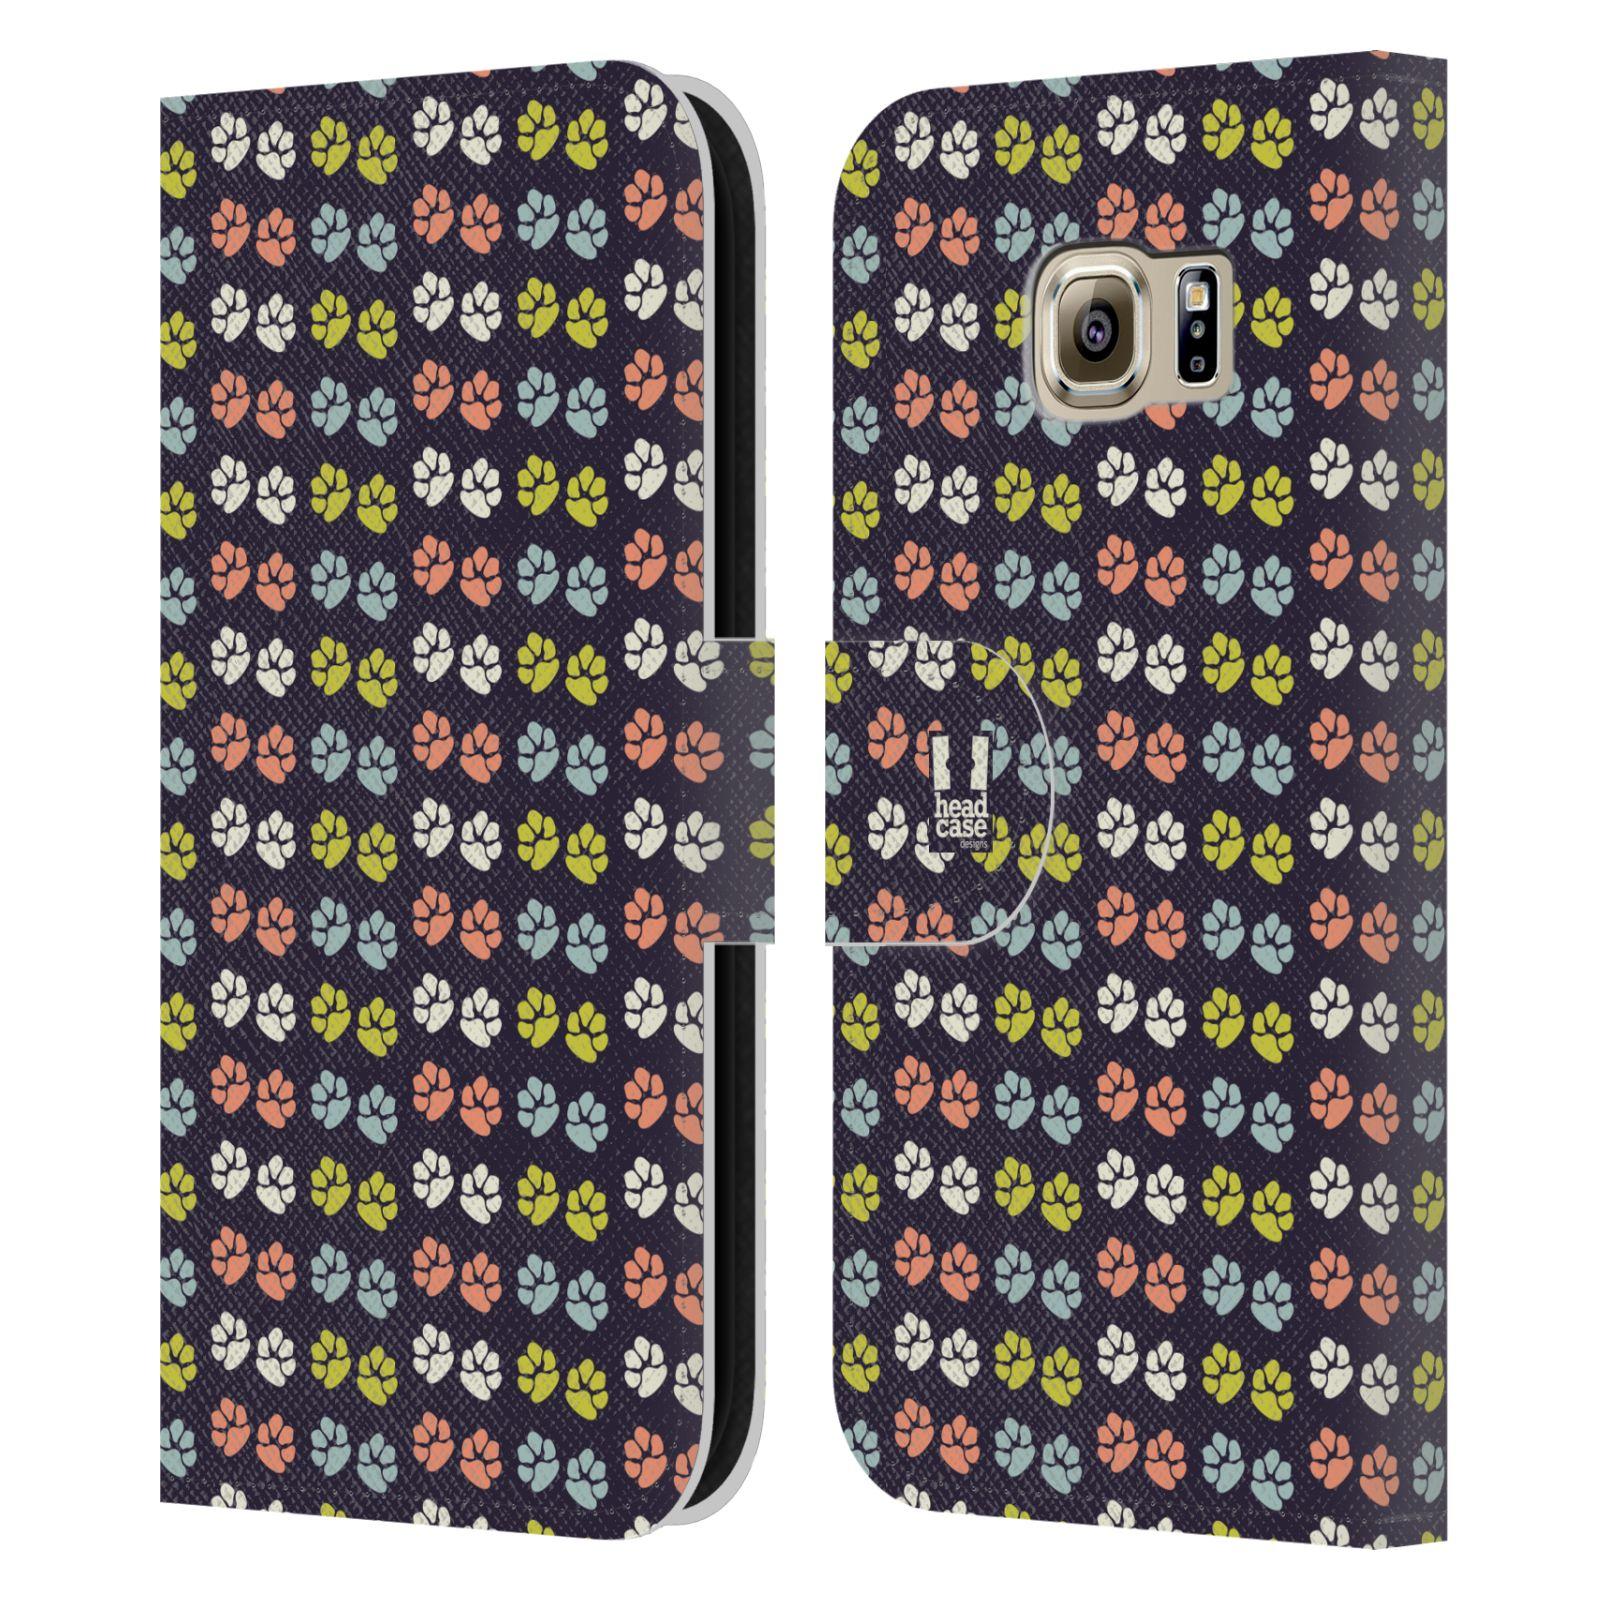 HEAD CASE Flipové pouzdro pro mobil Samsung Galaxy S6 (G9200) Pejsek ťapky barevné RETRO